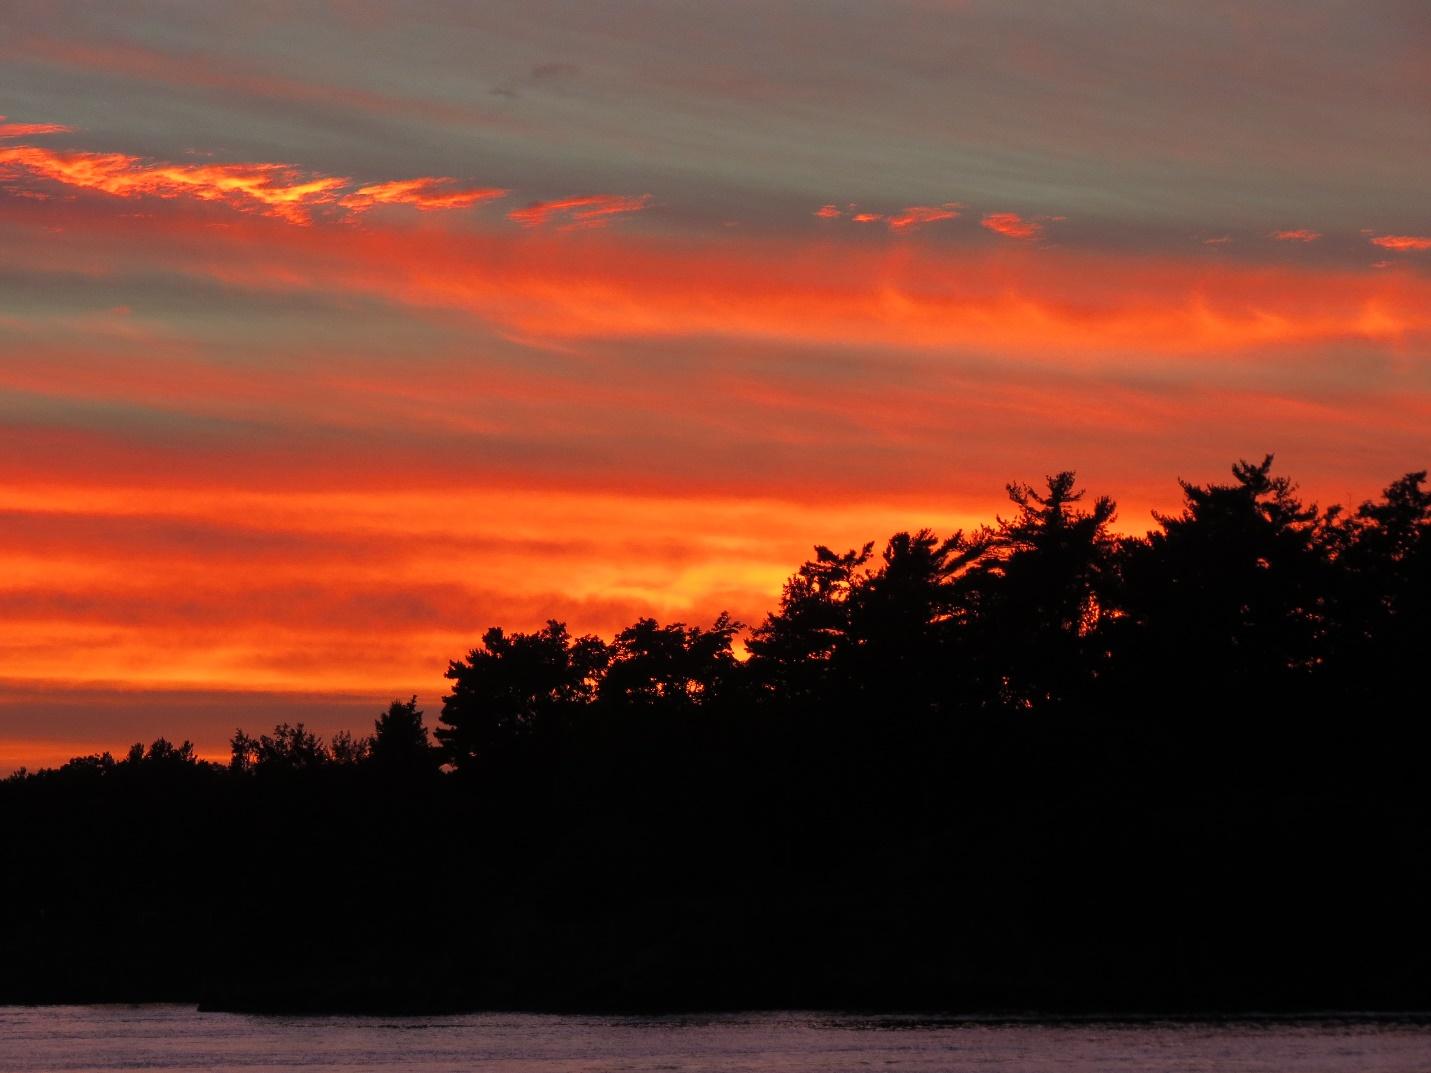 Sun setting over Alexandria Bay, NYS